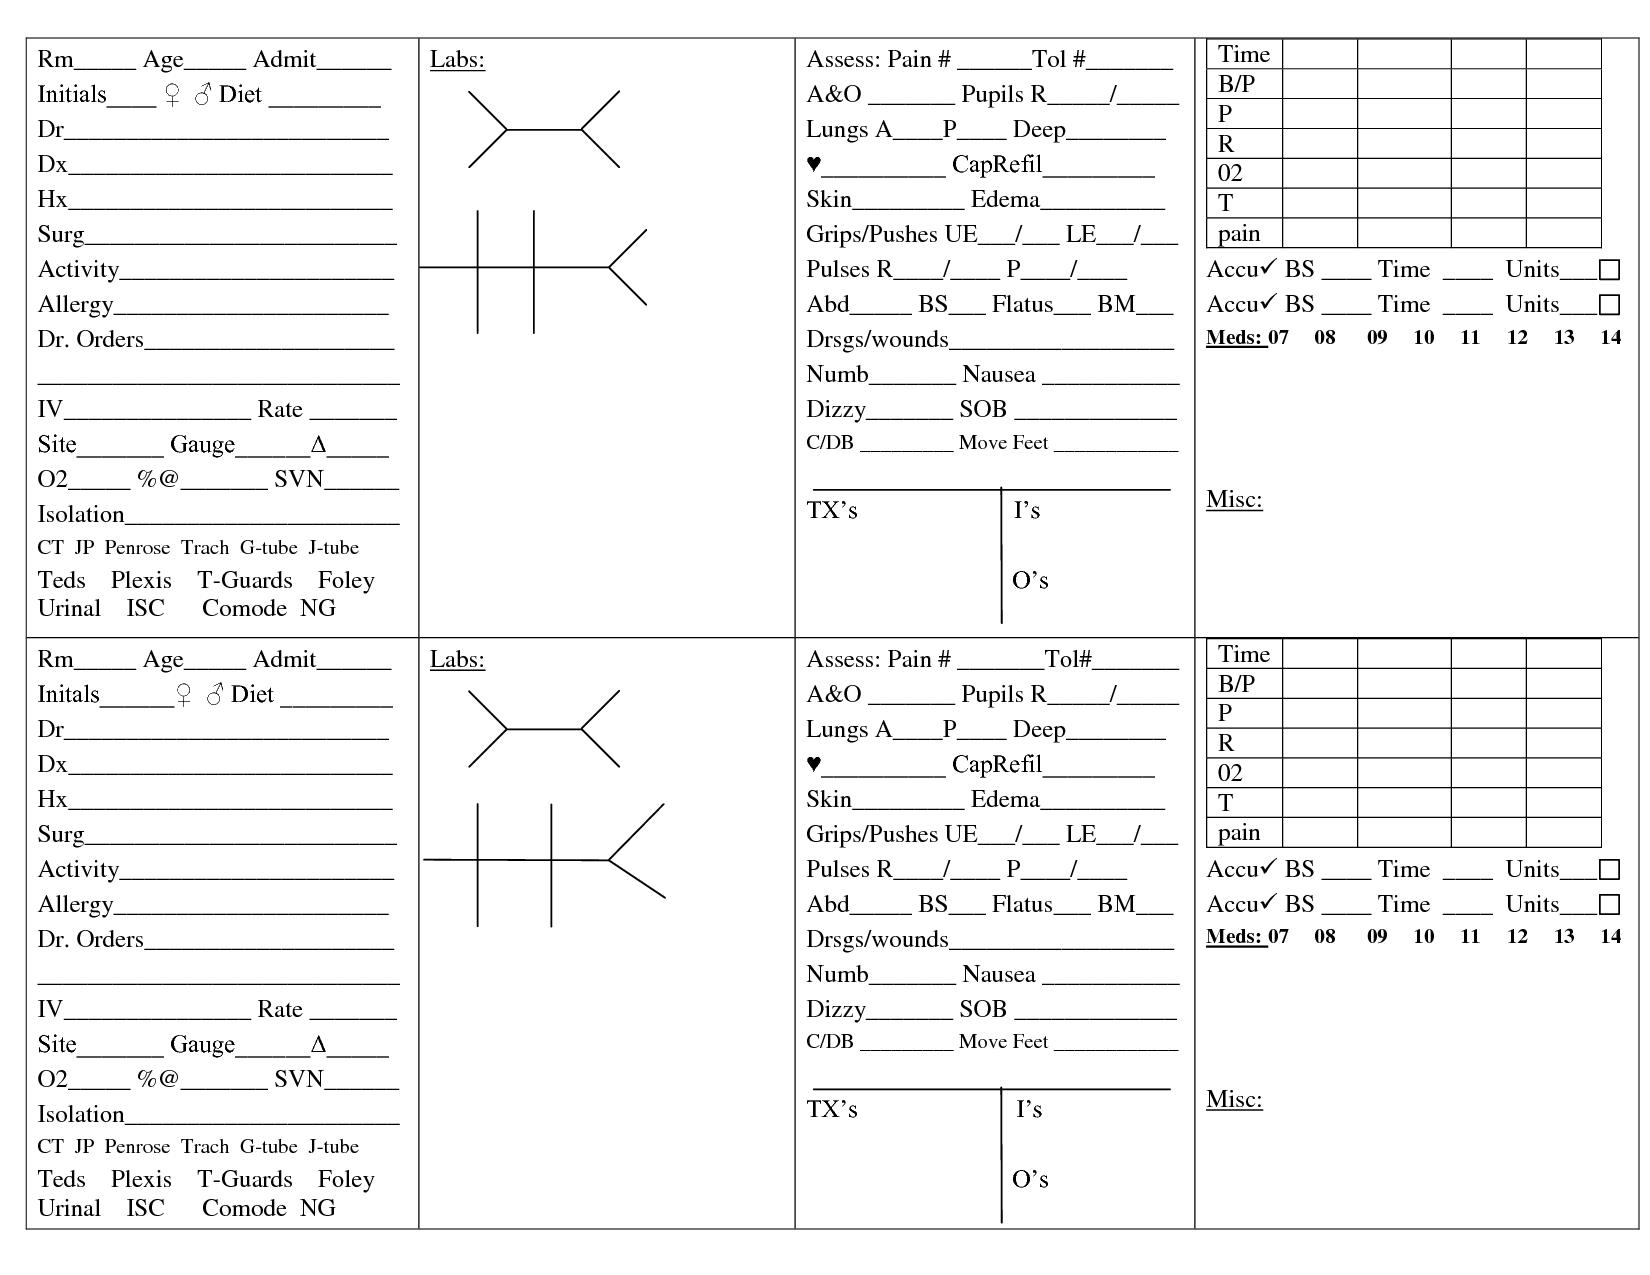 The Ultimate Nursing Brain Sheet Database 33 Nurse Report